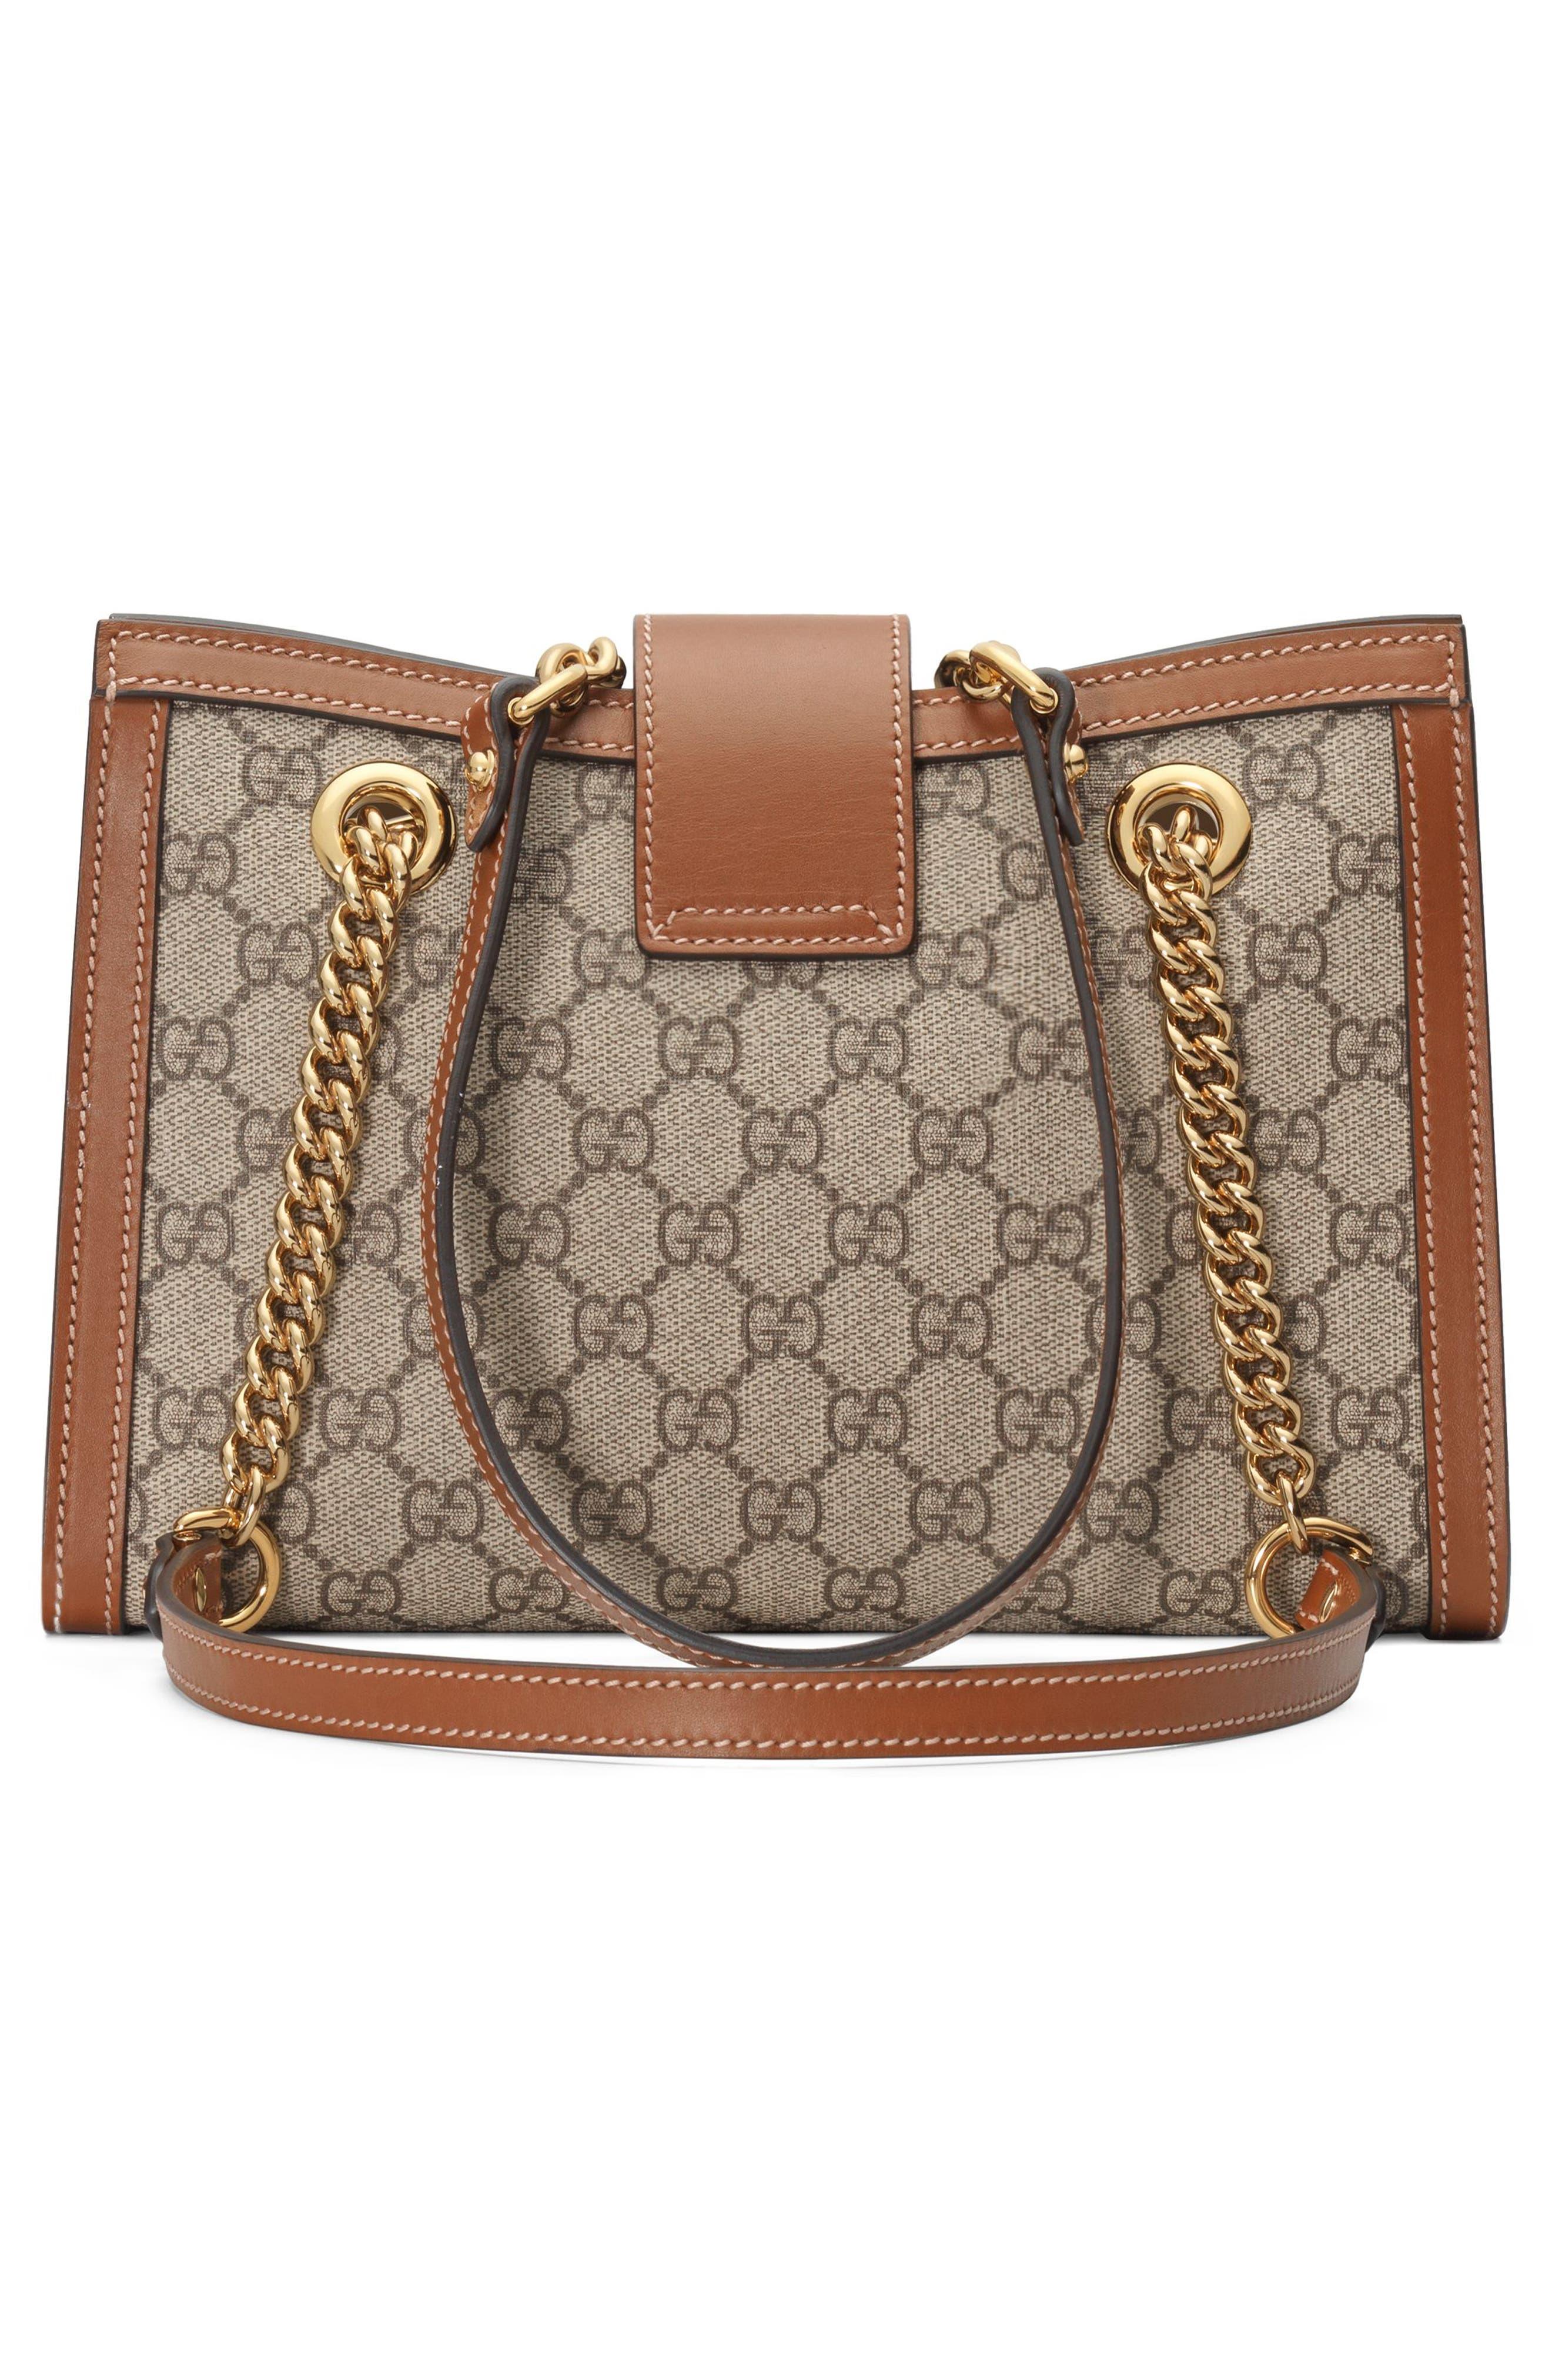 GUCCI, Small Padlock GG Supreme Shoulder Bag, Alternate thumbnail 2, color, BEIGE EBONY/ TUSCANY